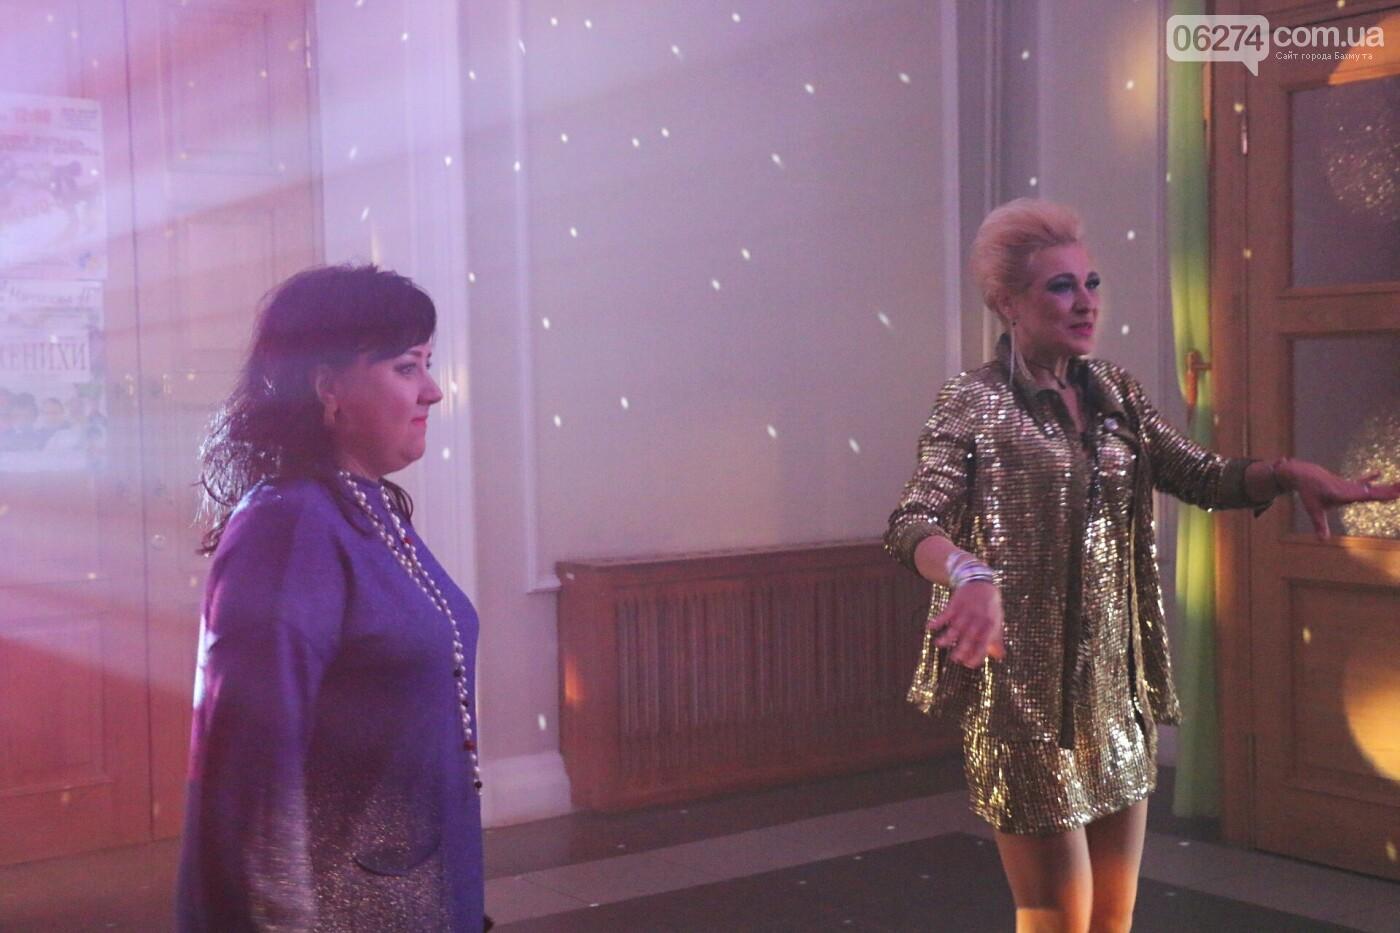 В Бахмуте провели Disco House Party (ФОТООТЧЕТ), фото-38